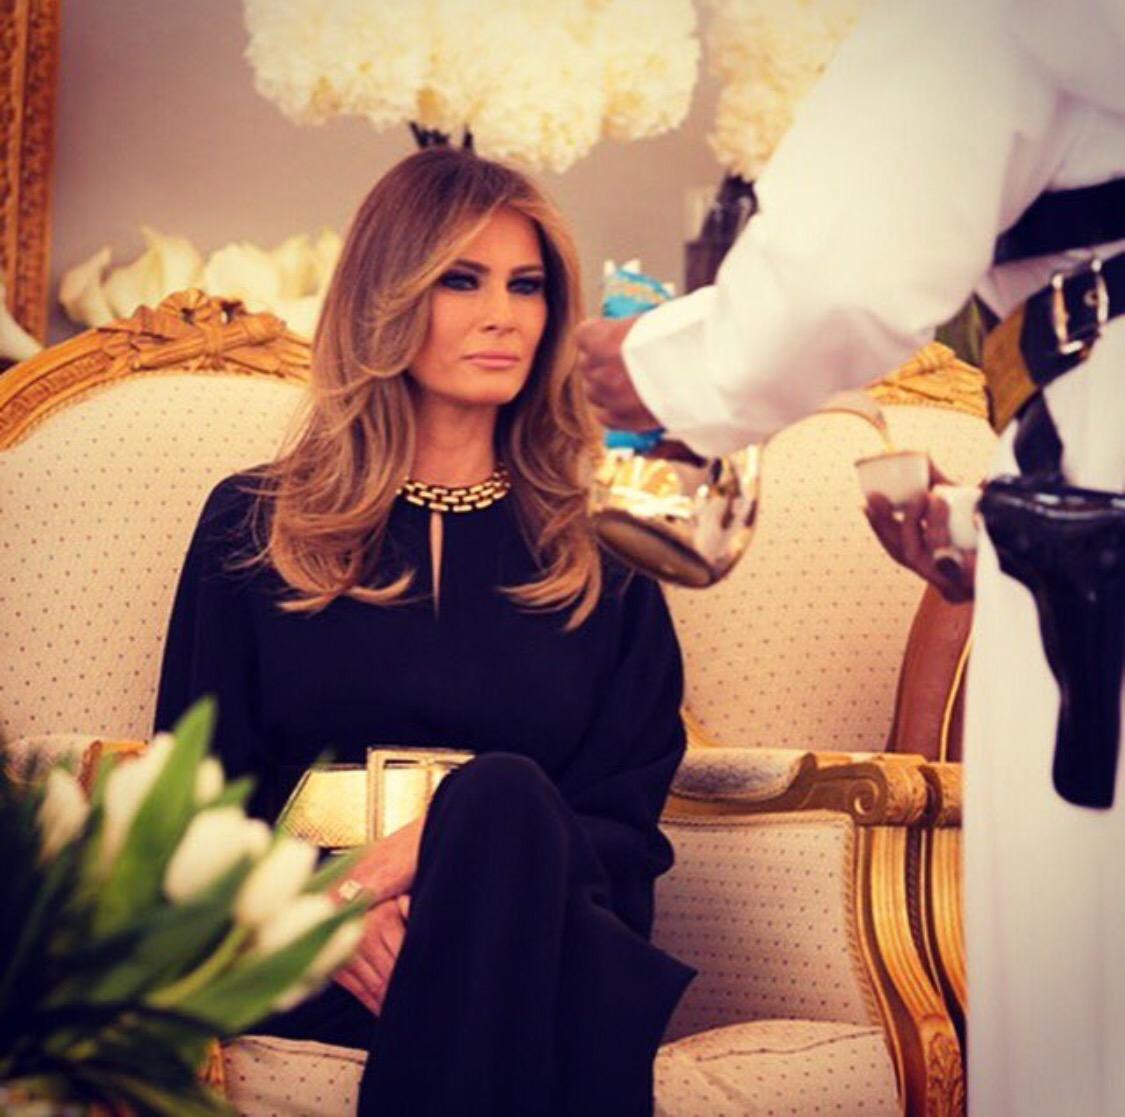 SAUDI ARABIA: Historic Photo of First Lady Melania Trump being served tea by armed Saudi male servant